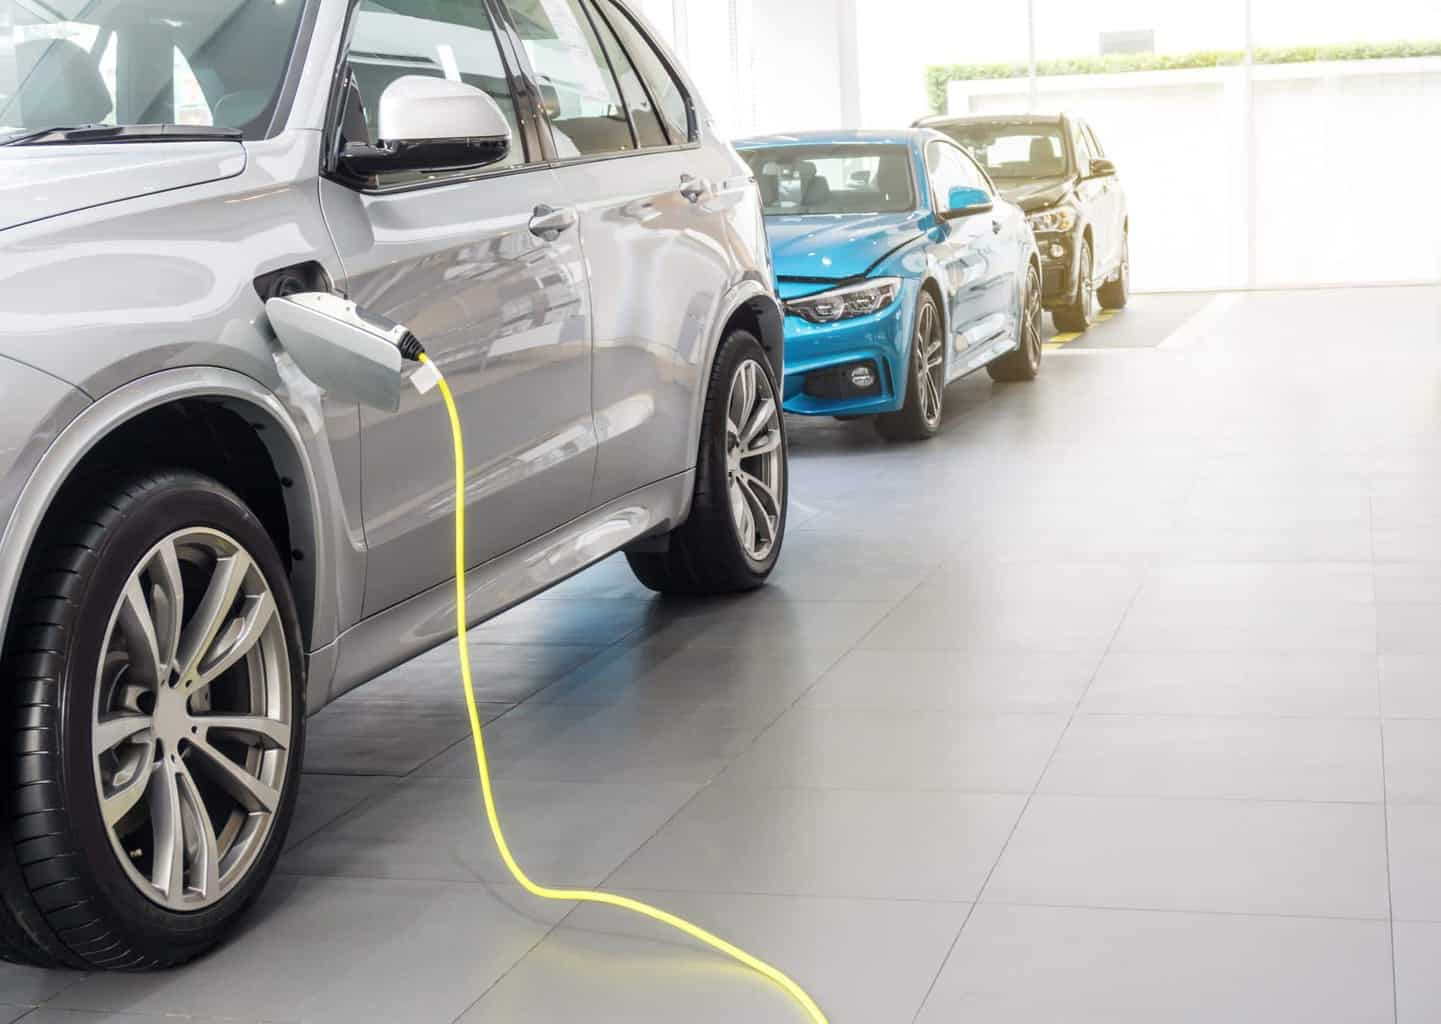 Vehiculum: VW e-up! leasen ab 37 Euro/Monat [Gewerbekunden]